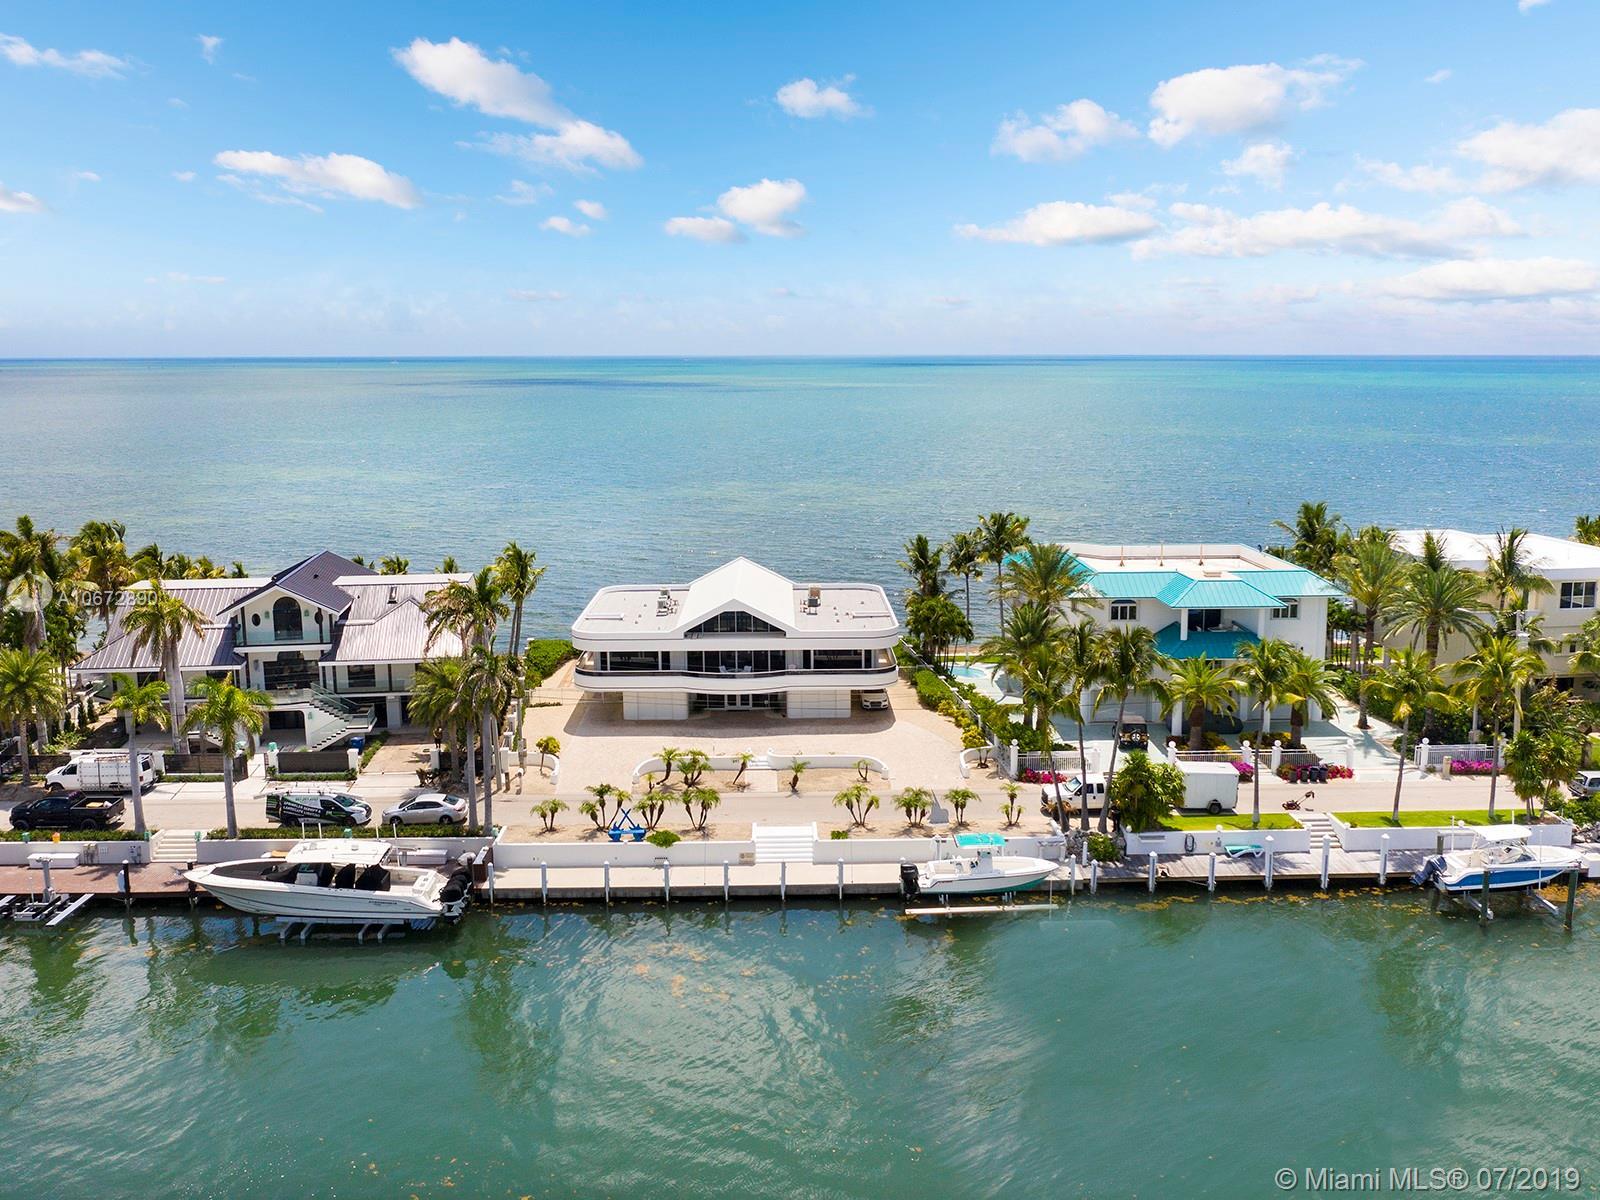 557 Ocean Cay Dr, Other City - Keys/Islands/Caribb, FL 33037 - Other City - Keys/Islands/Caribb, FL real estate listing